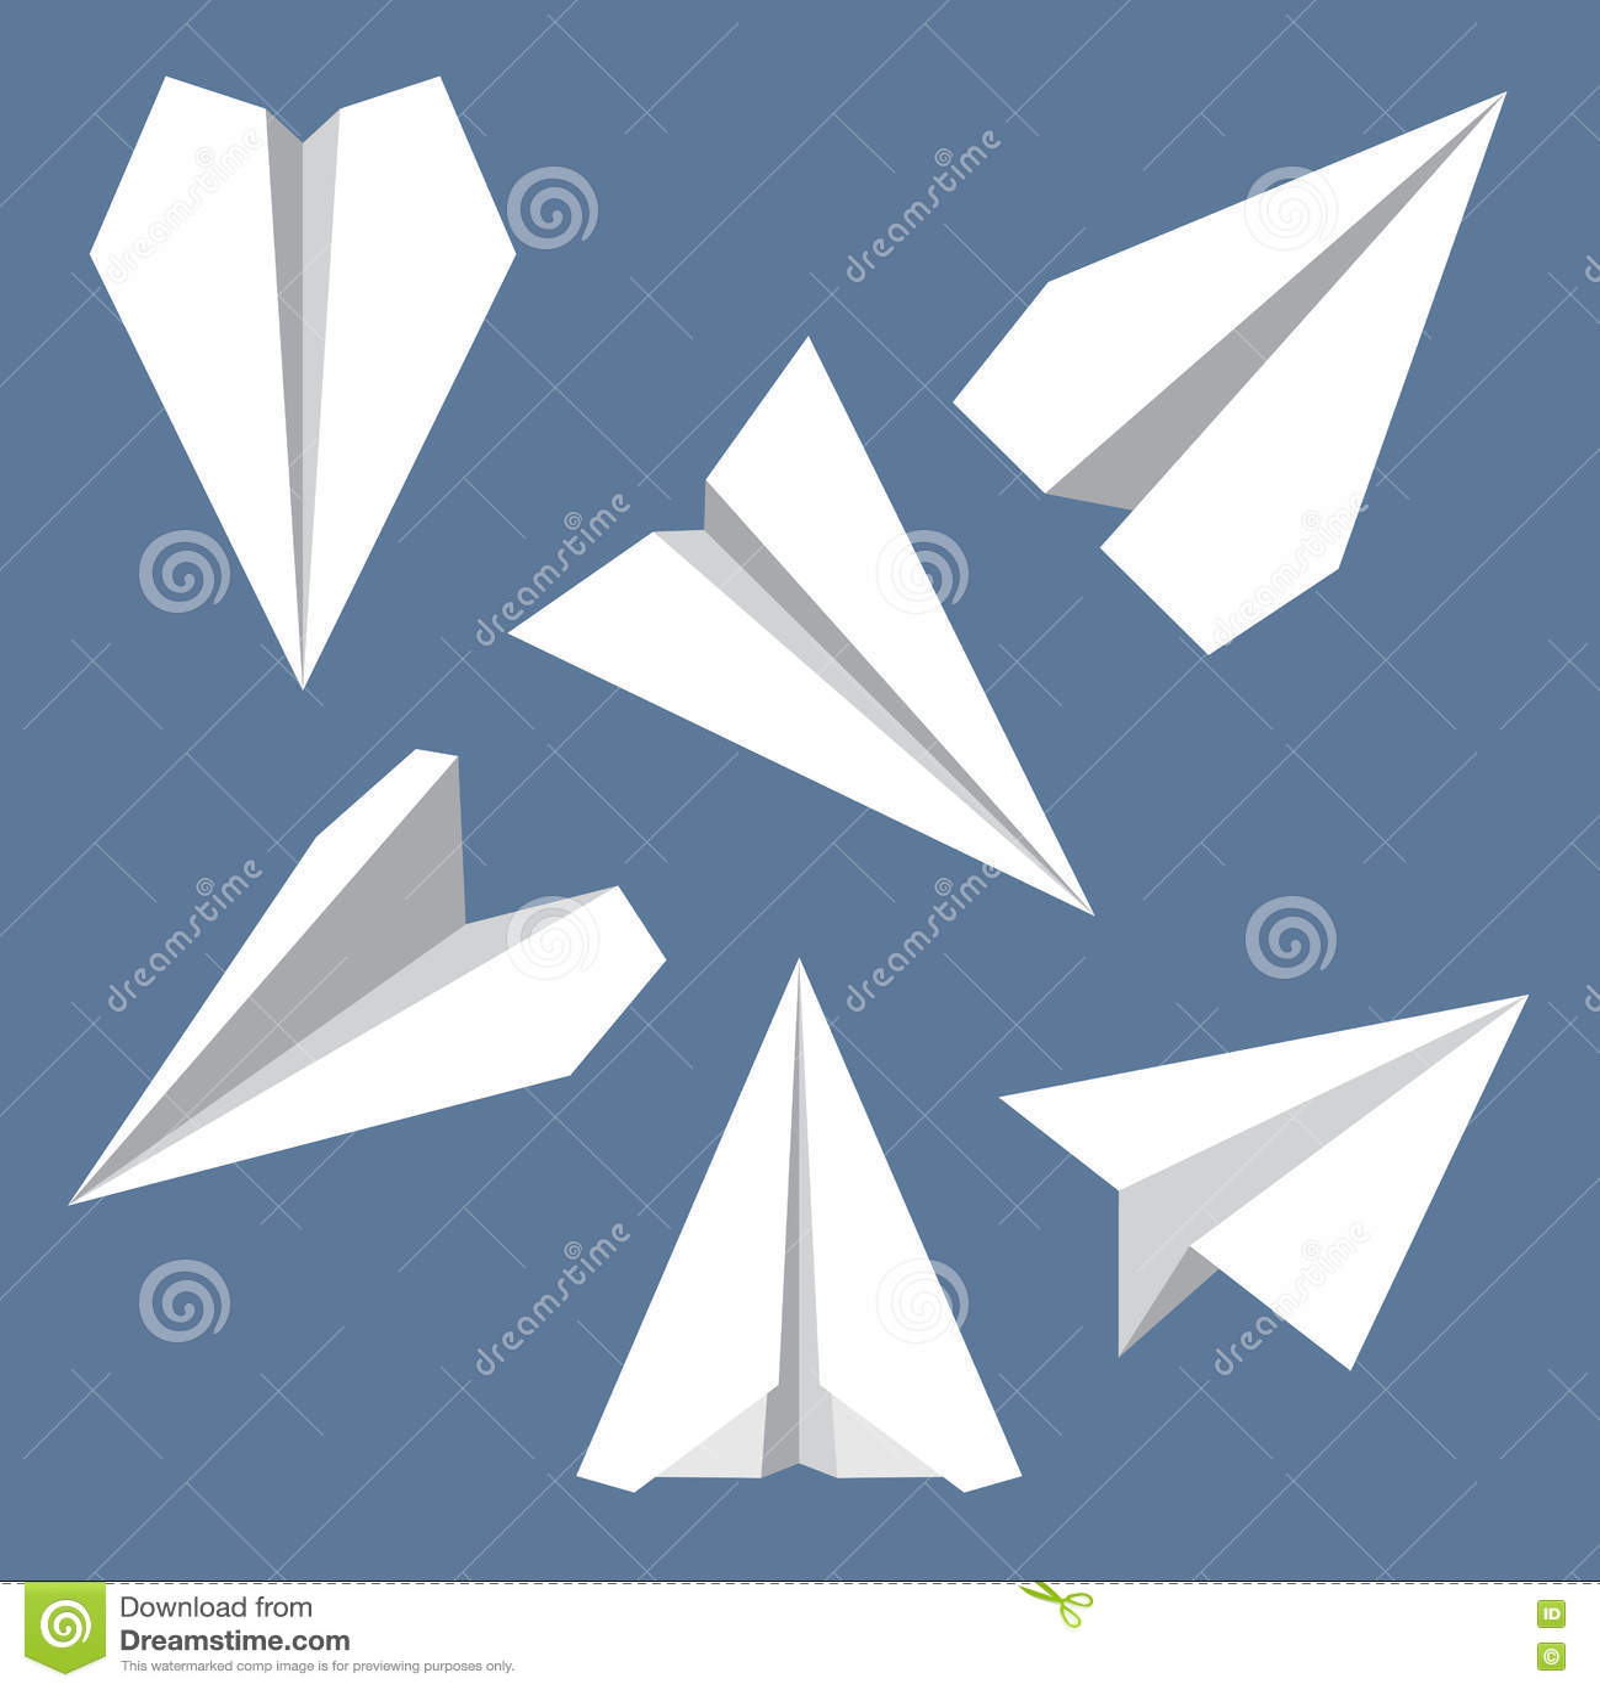 Origami planes |